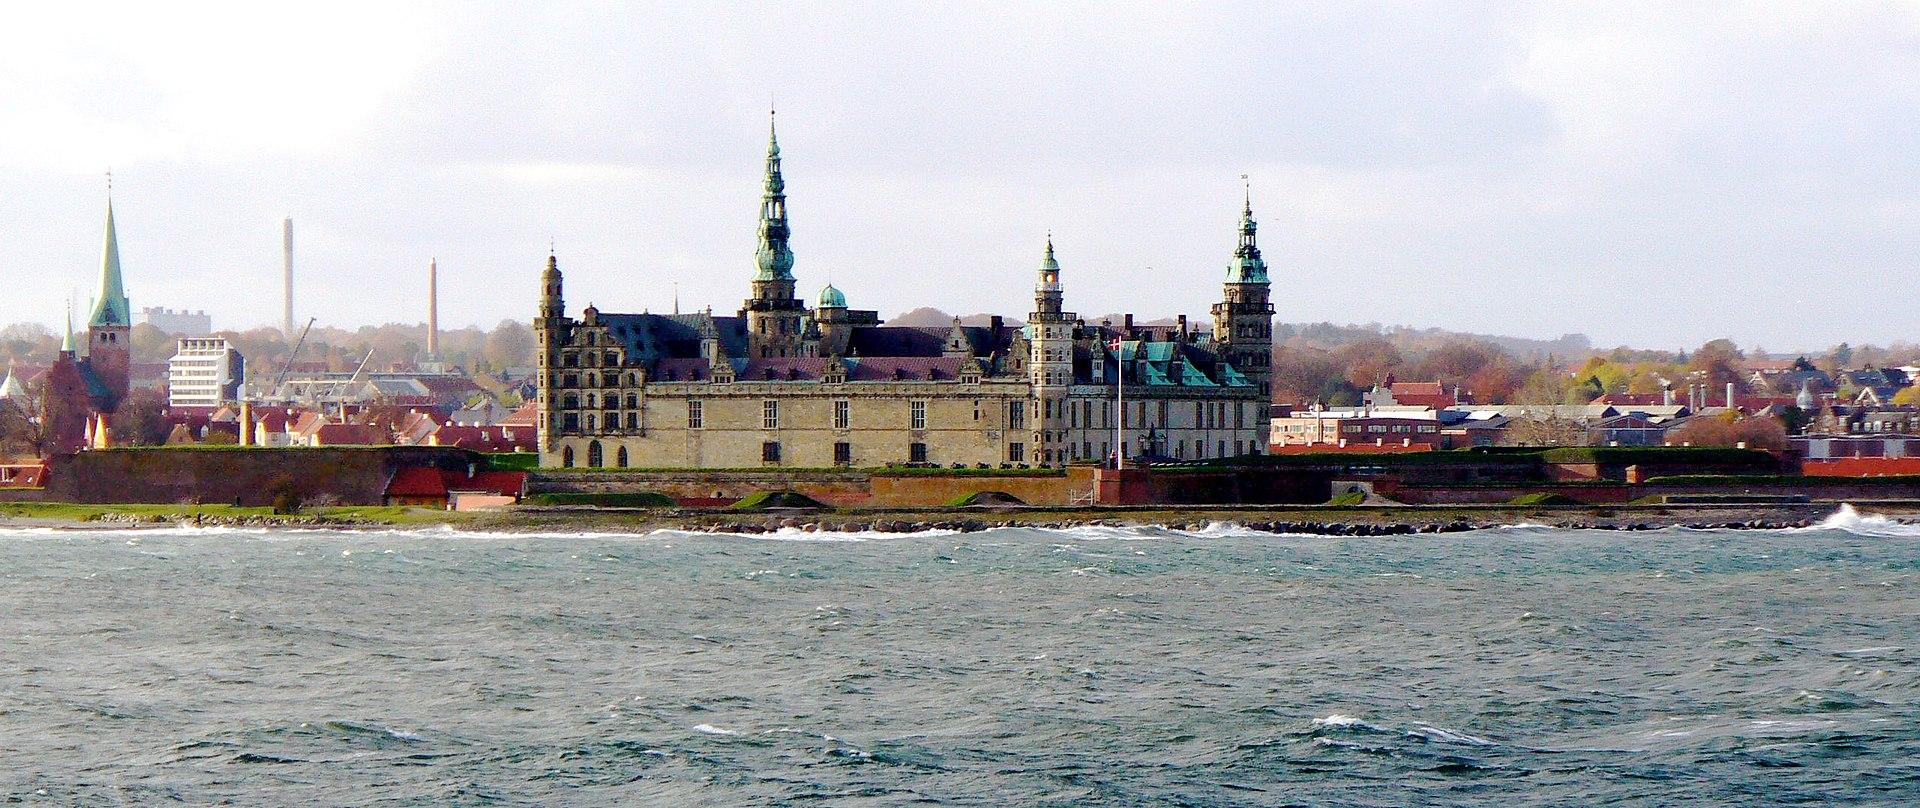 Helsingør waterfront in November 2006